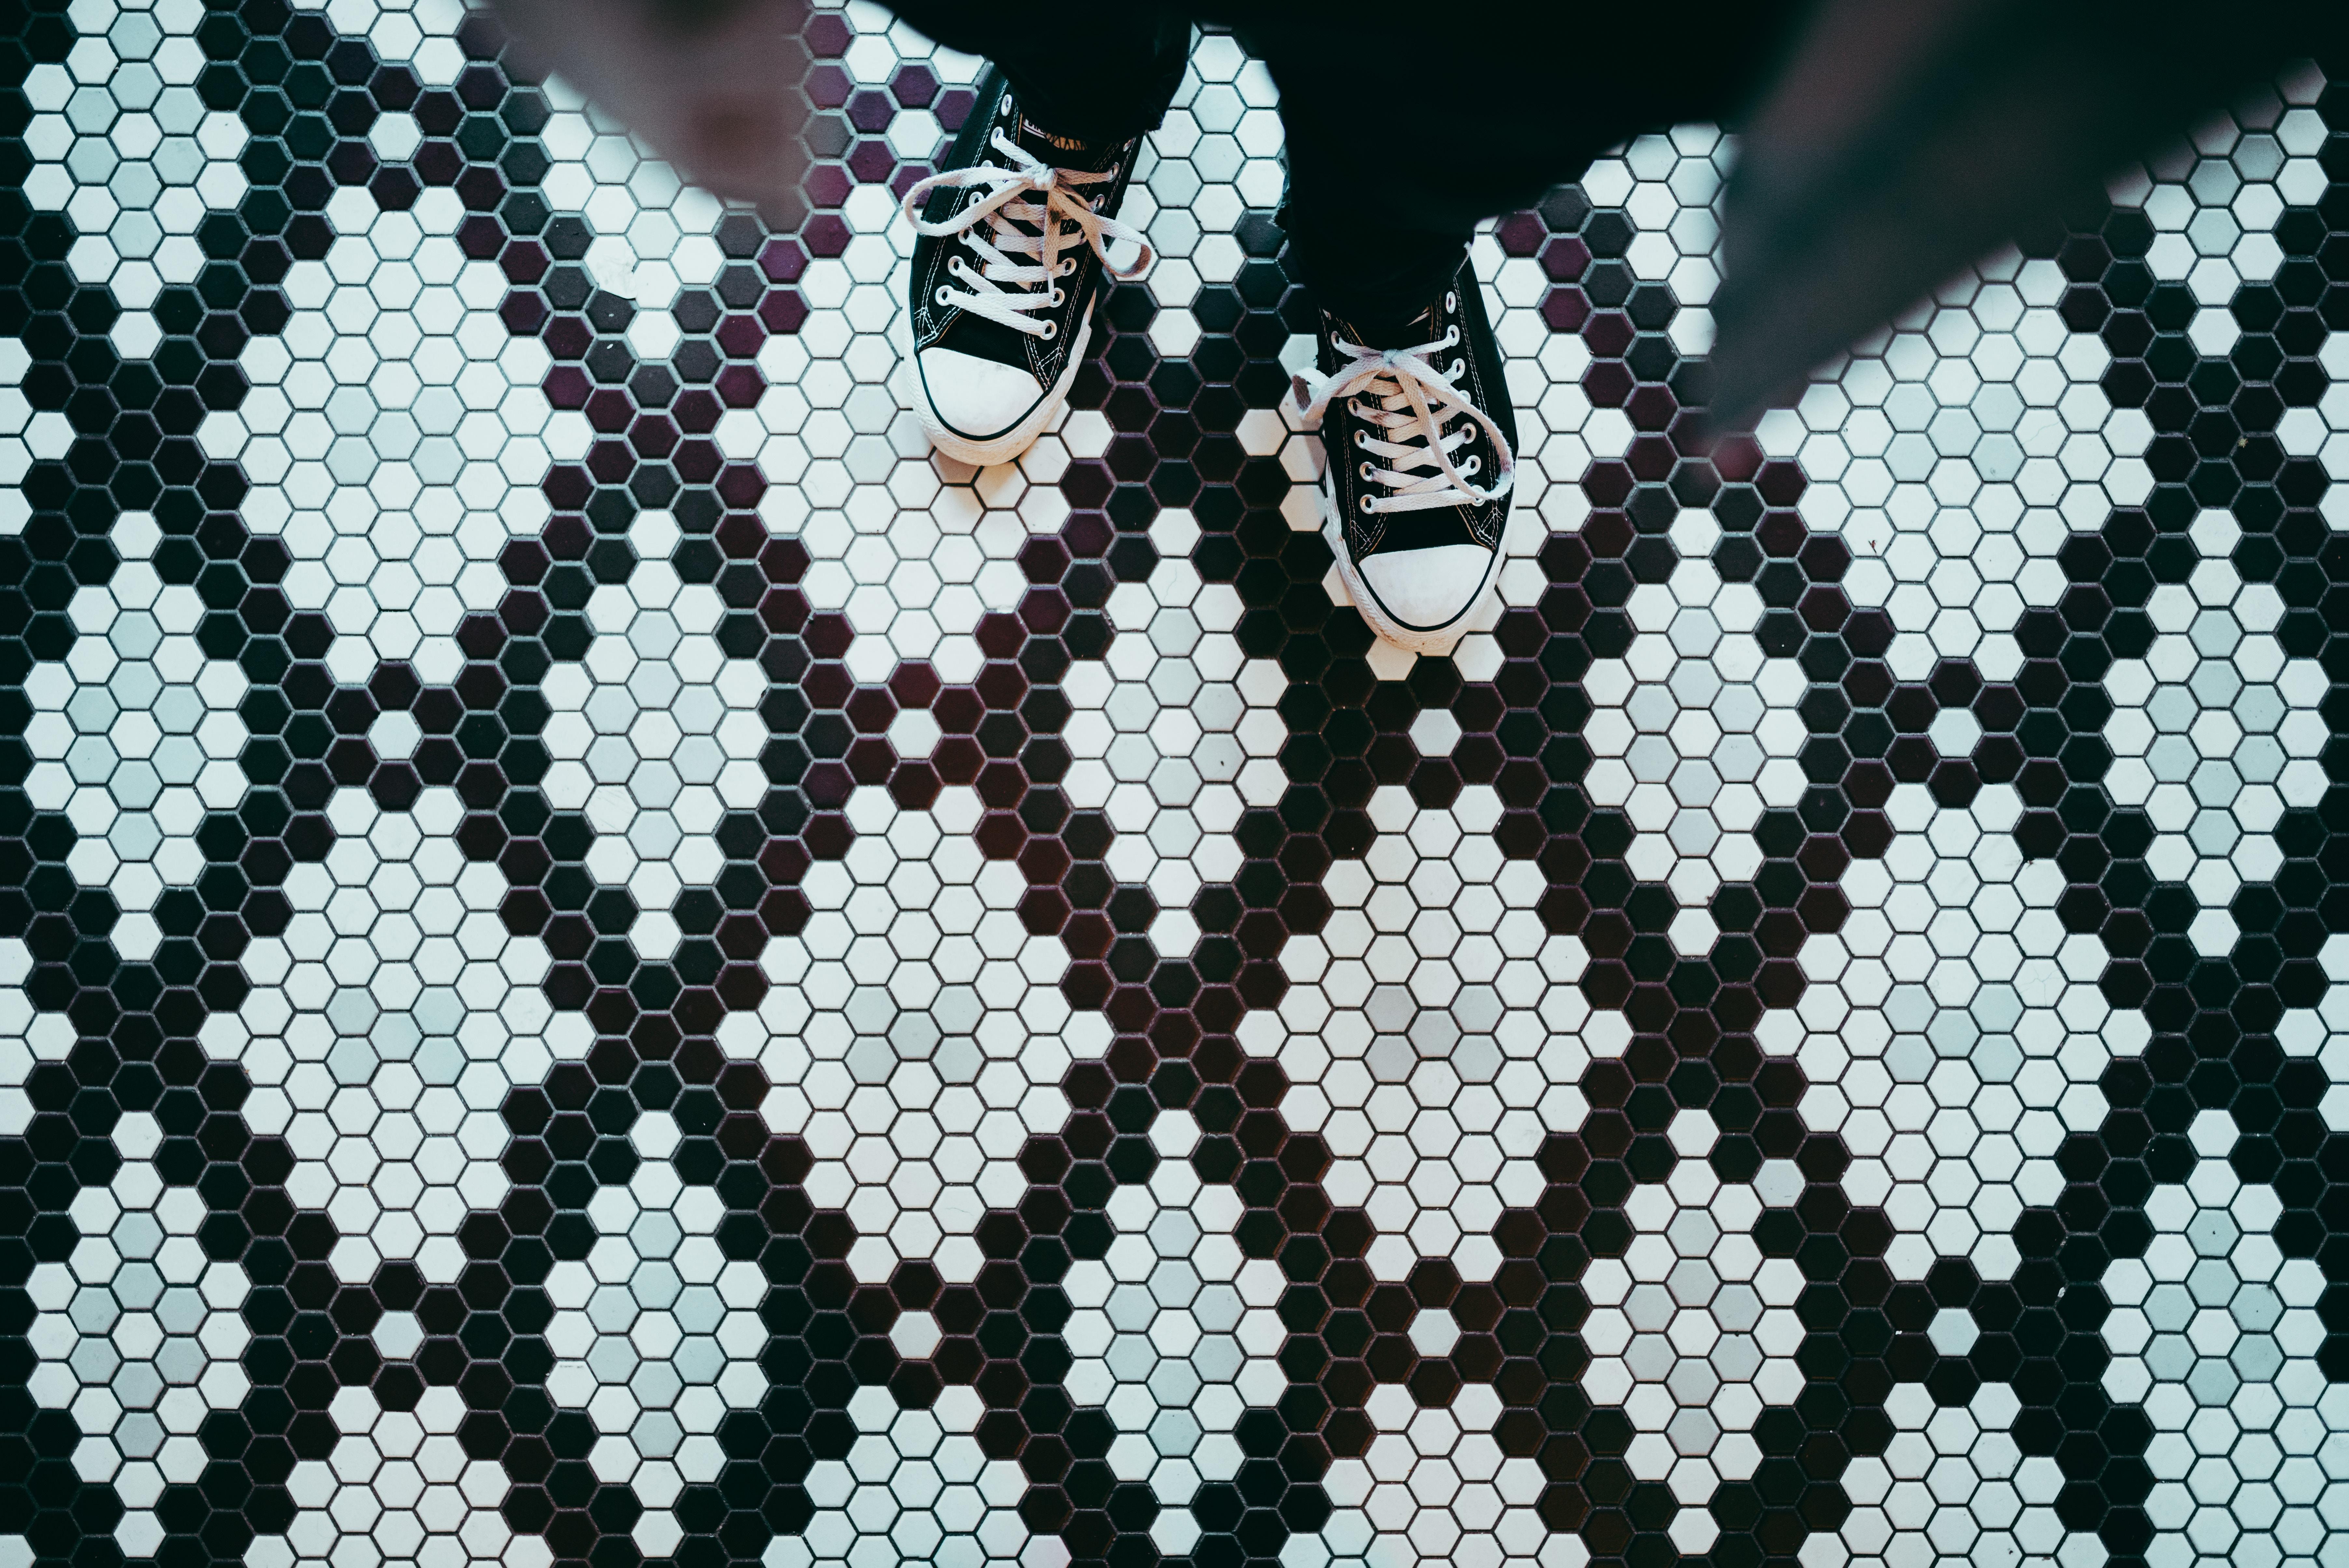 patroon tegels